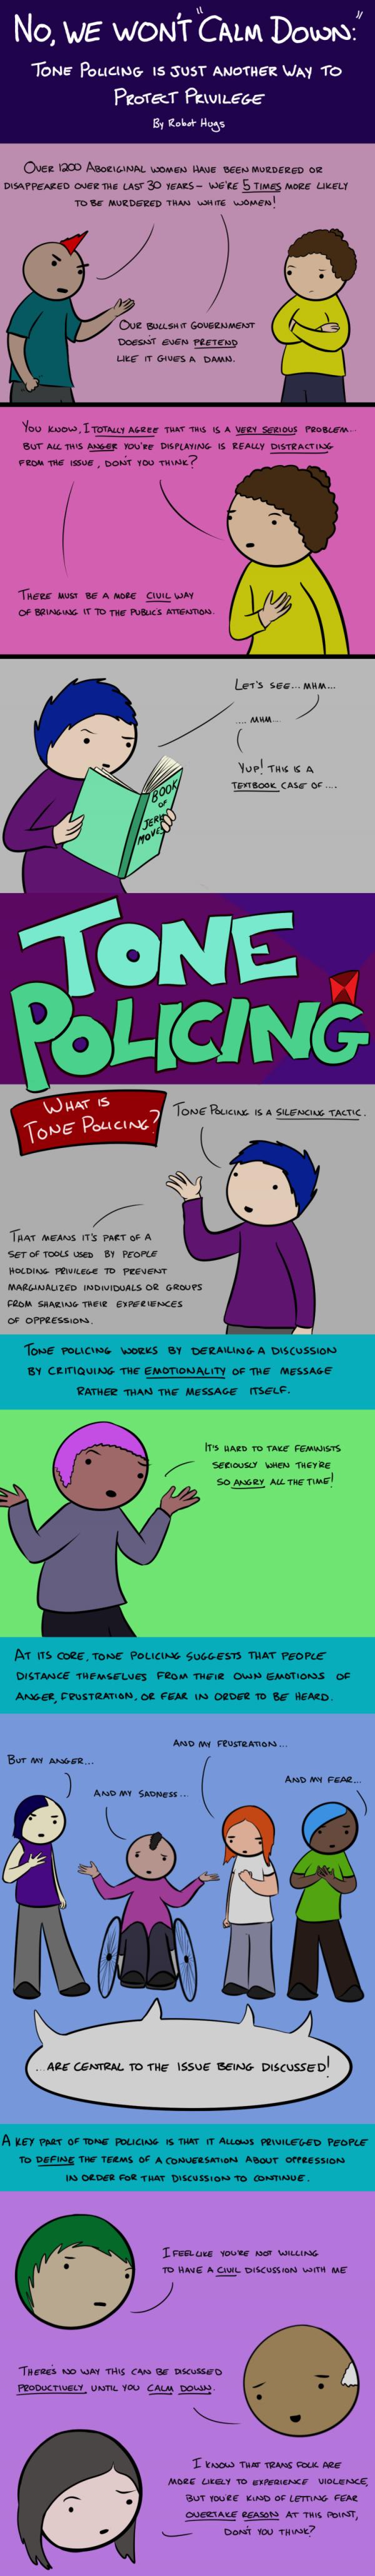 tone-policing1